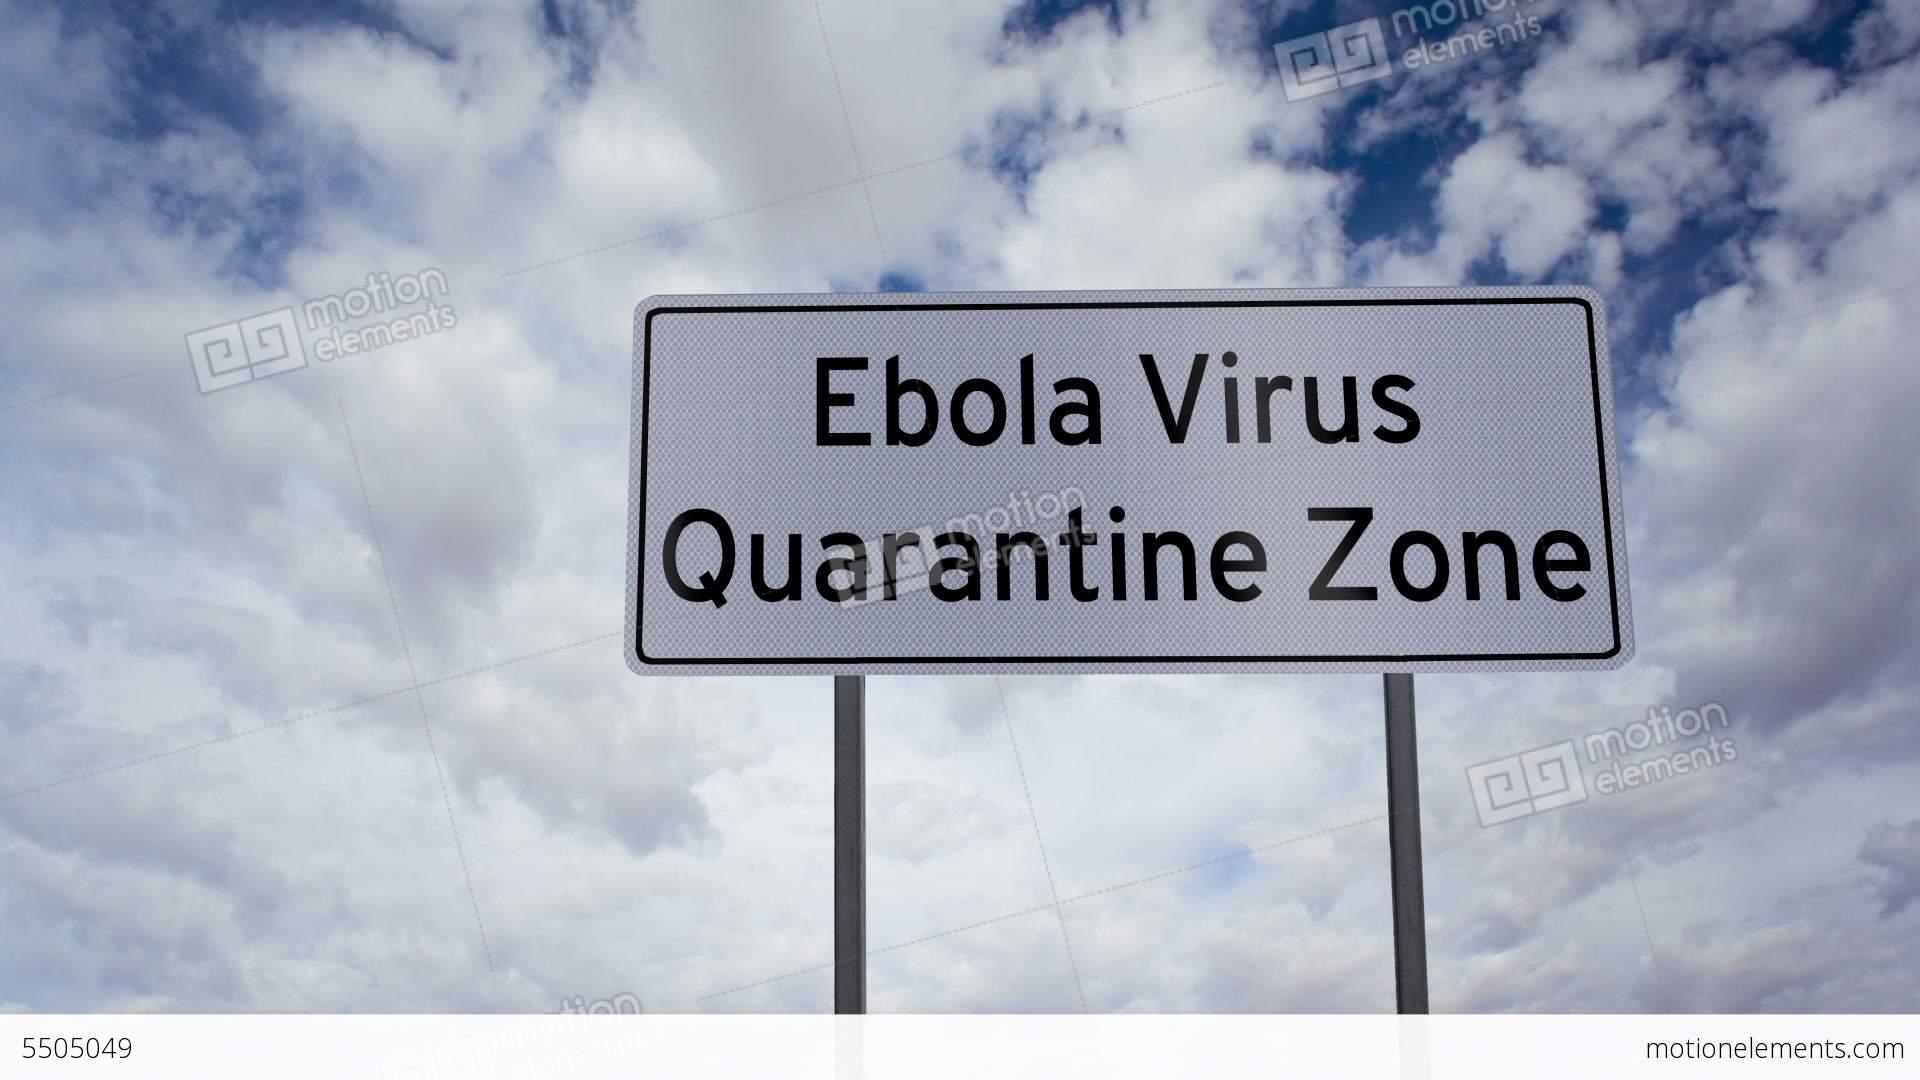 Ebola Quarantine Zone